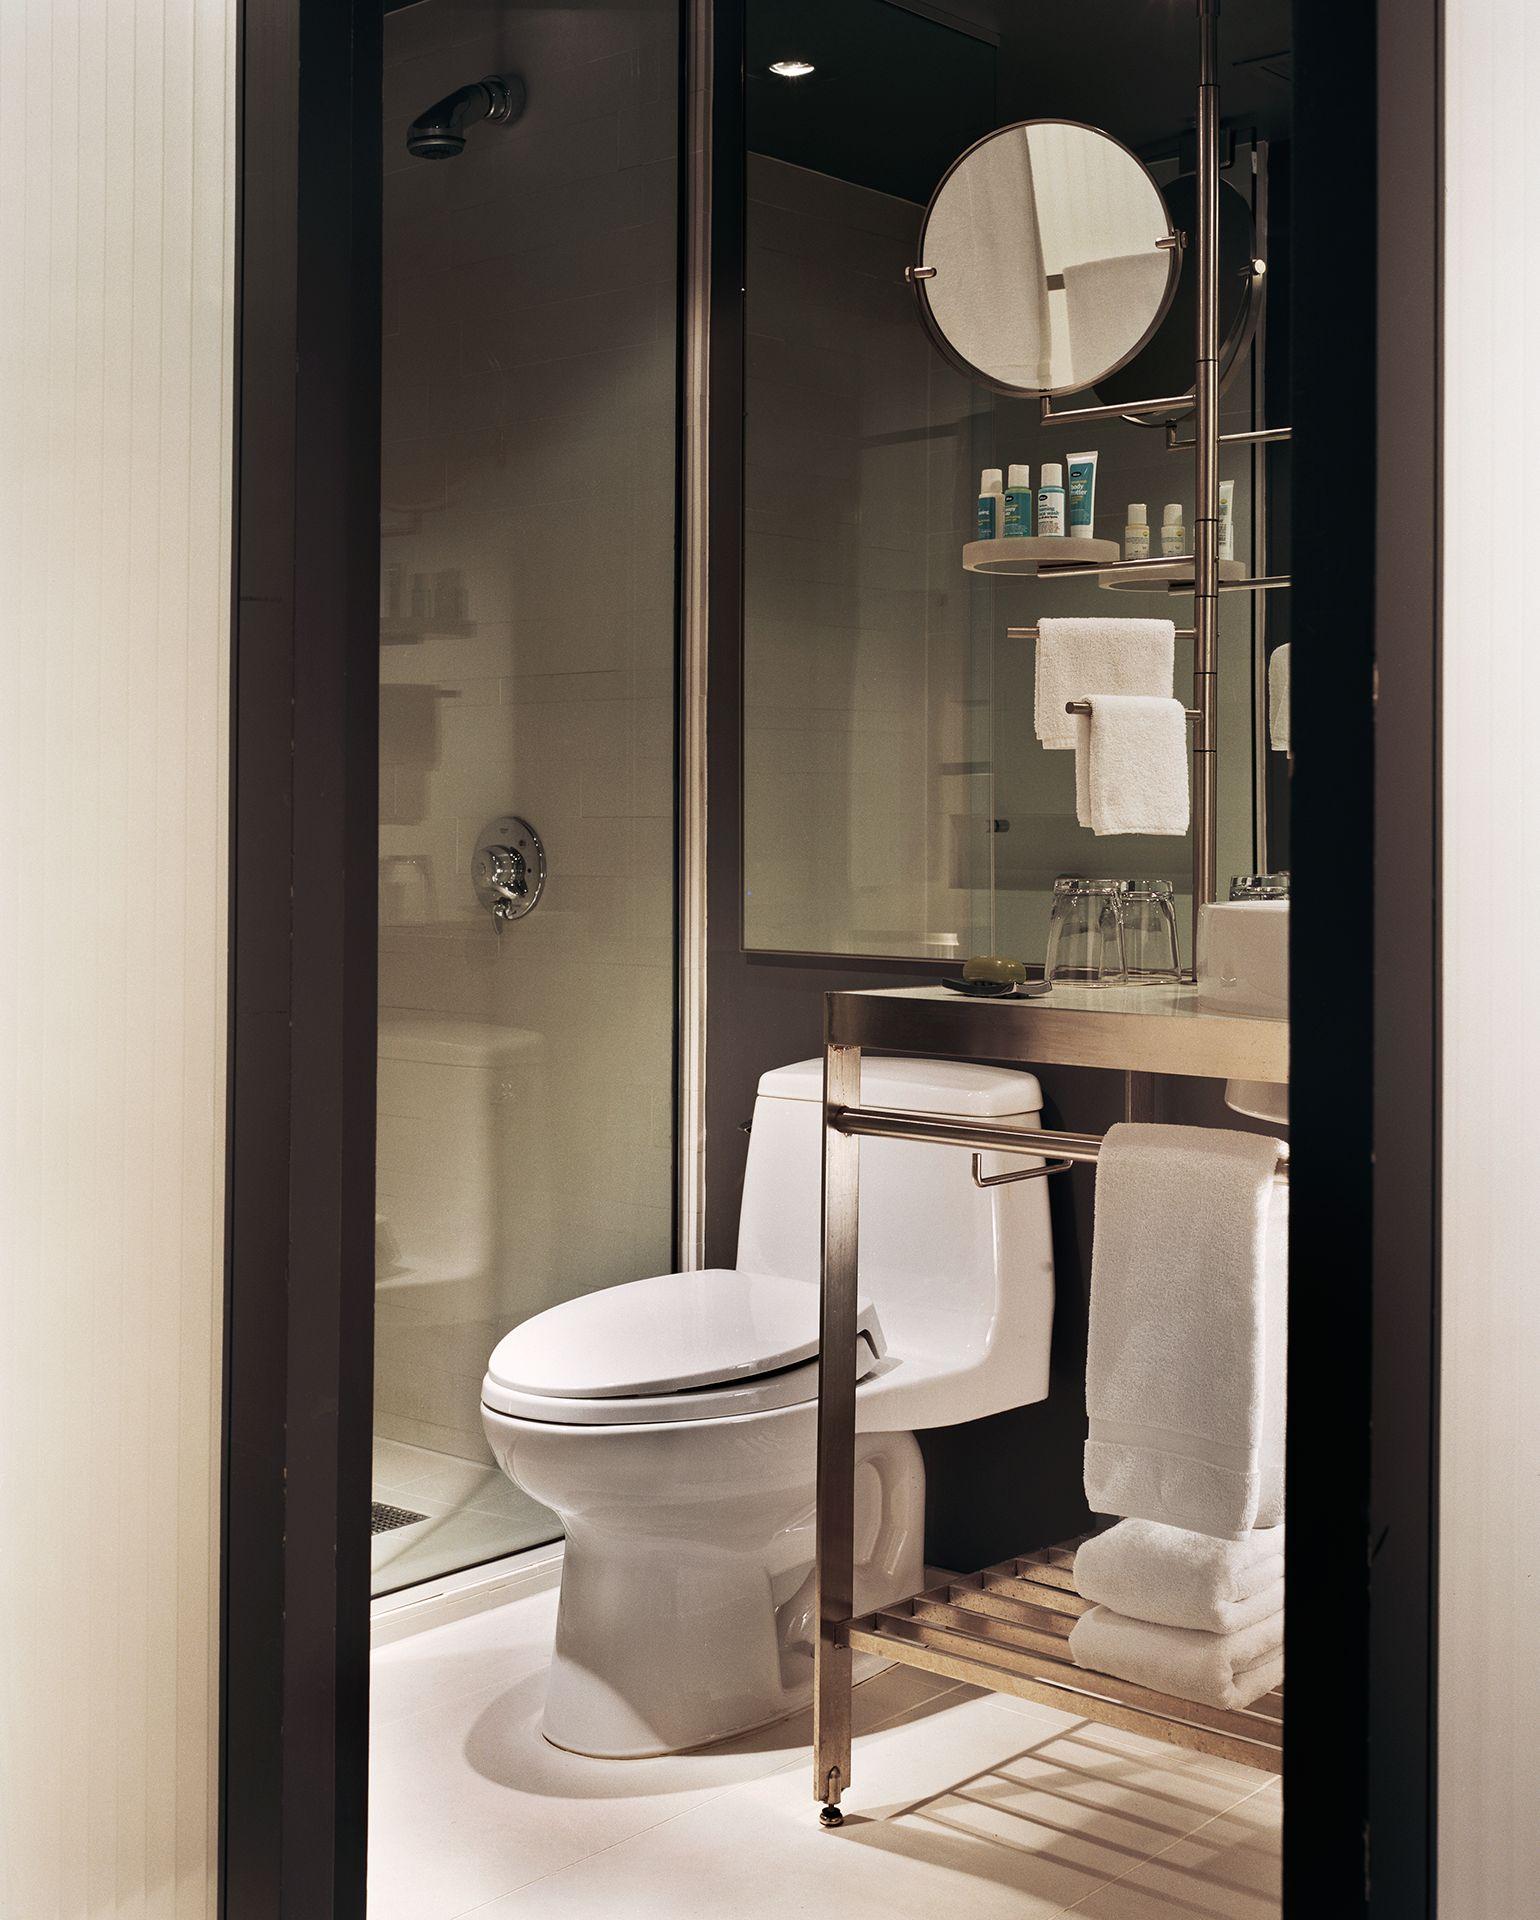 UltraMax e Piece Toilet 1 6 GPF ADA pliant Elongated Bowl